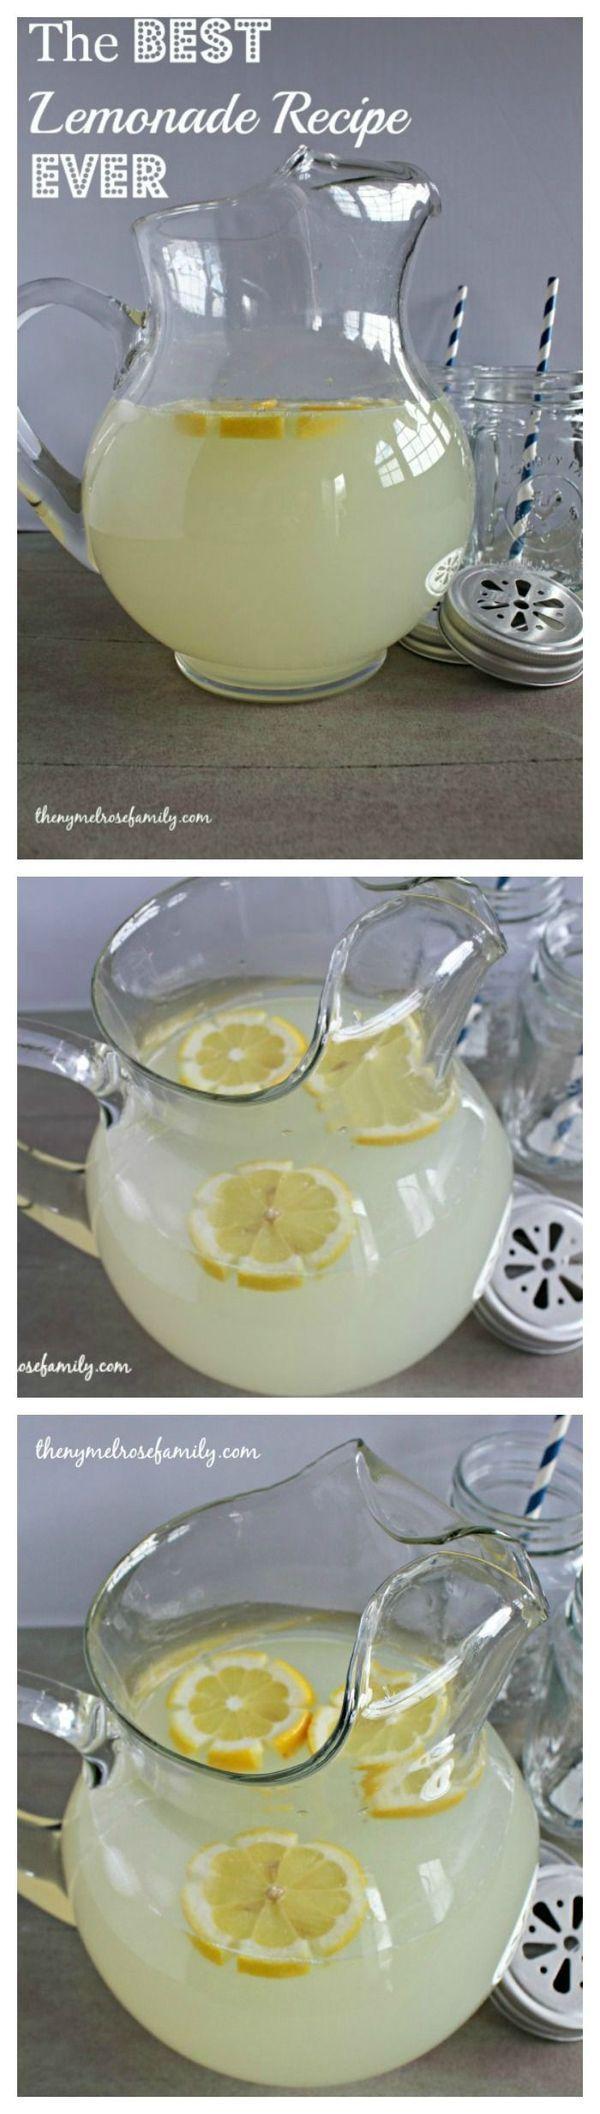 The BEST Lemonade Recipe EVER!